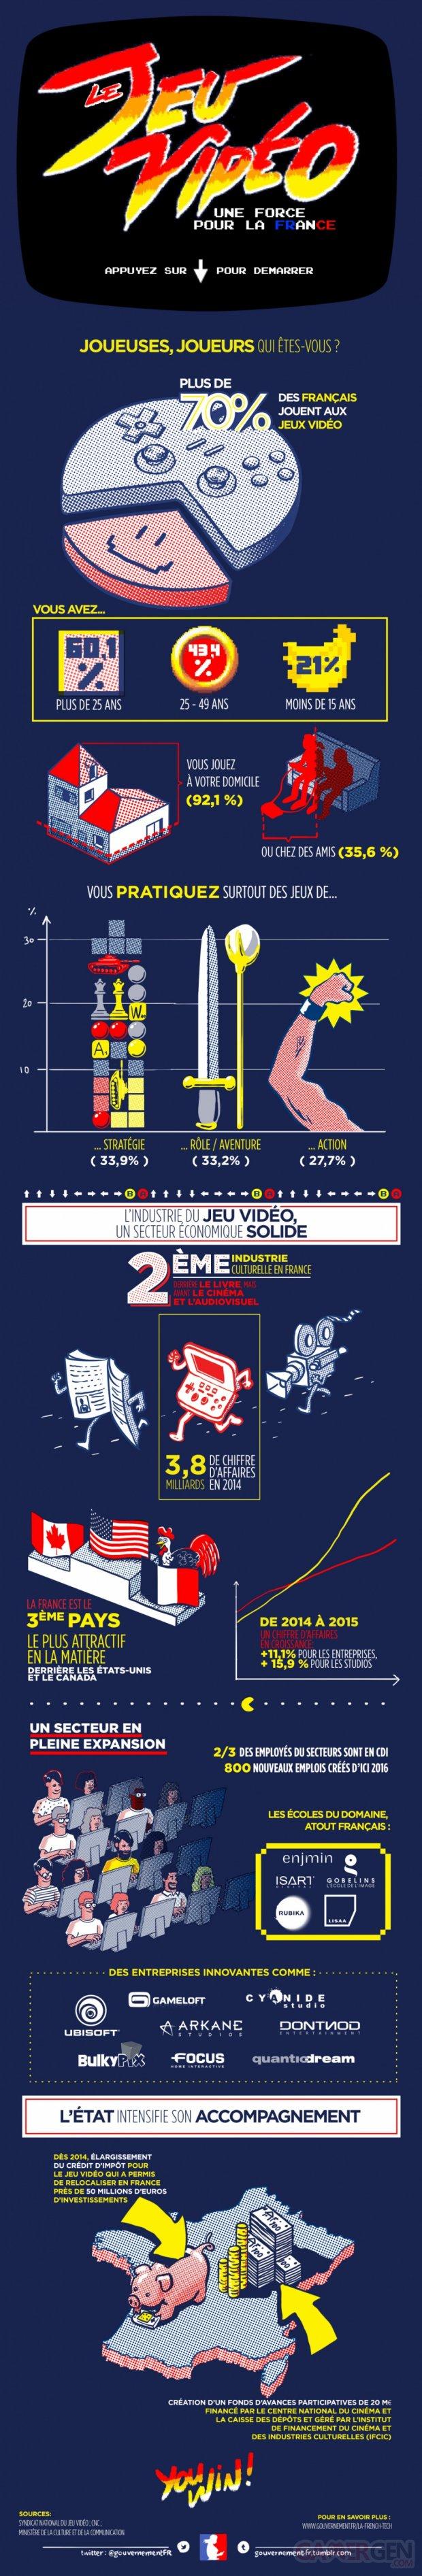 paris game week infographie2b jeu vidéo France 2015